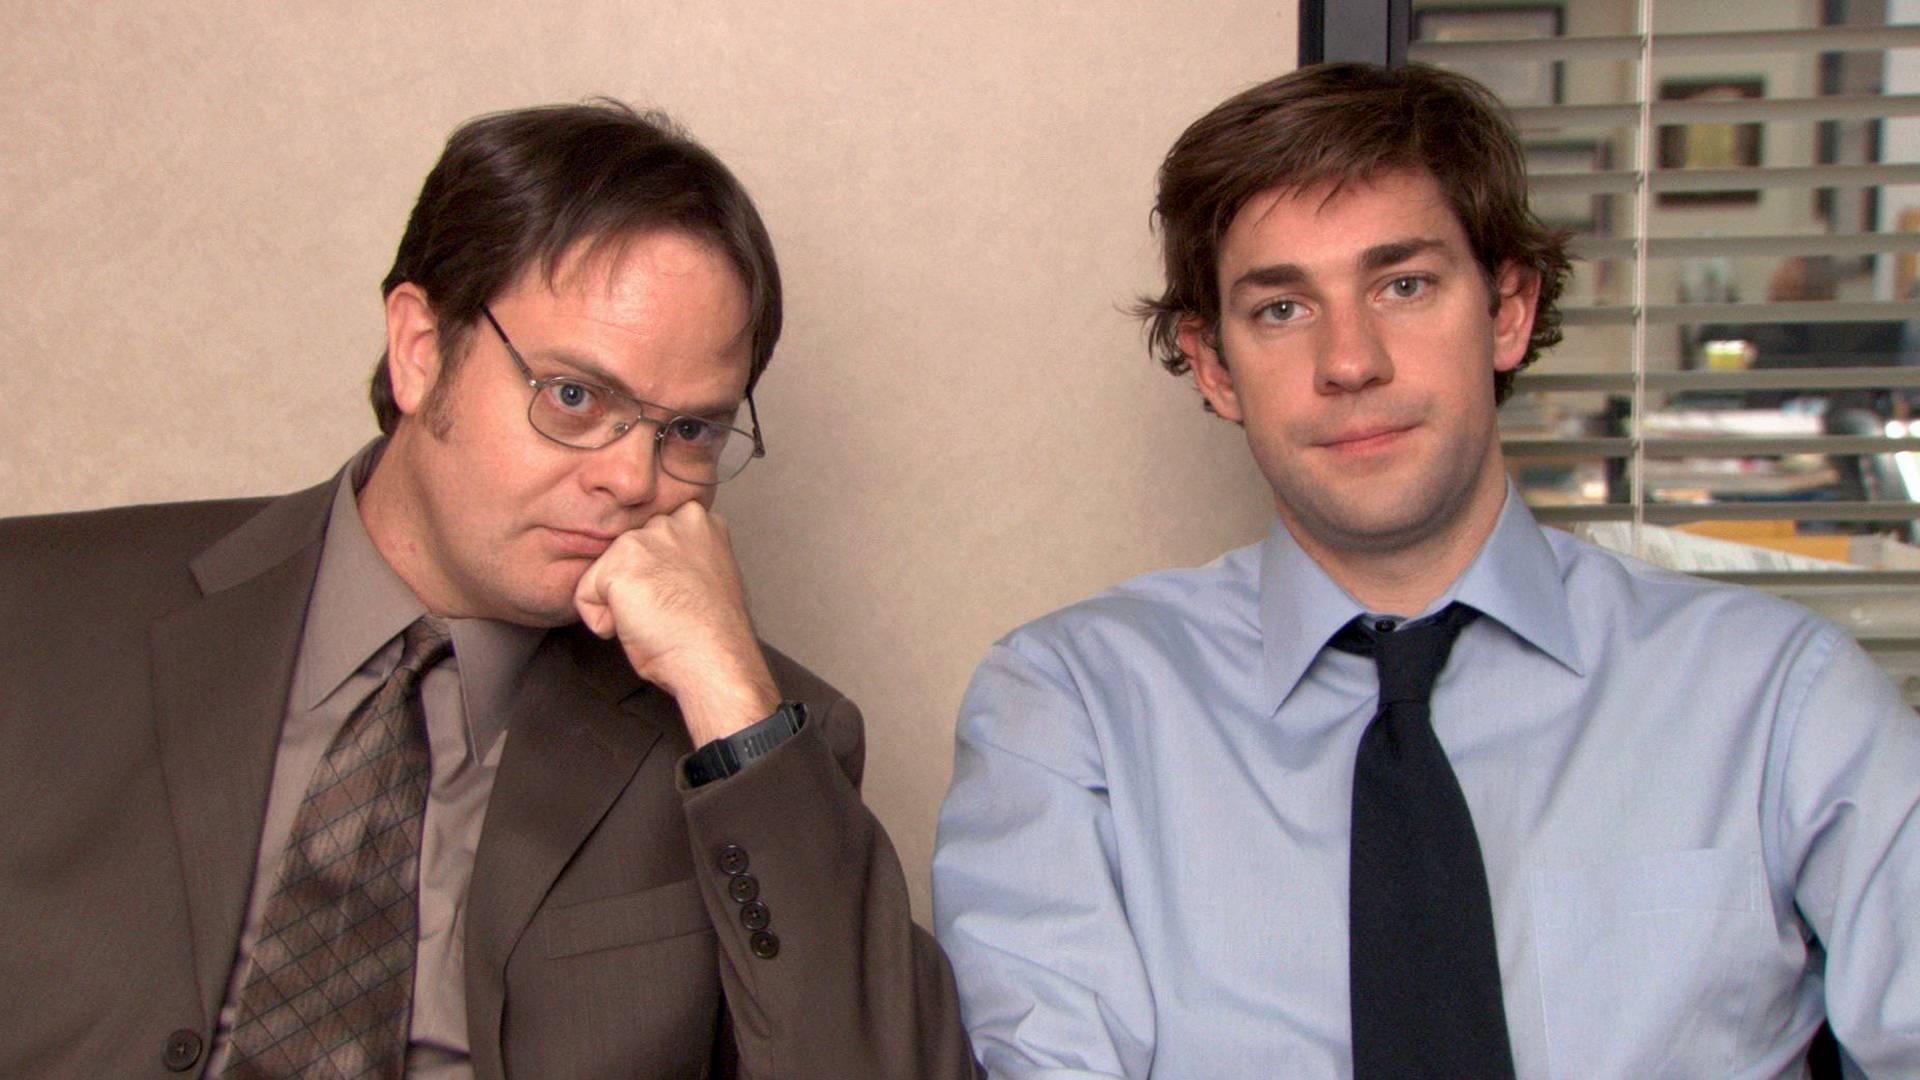 The Office Season 5 Episode 16